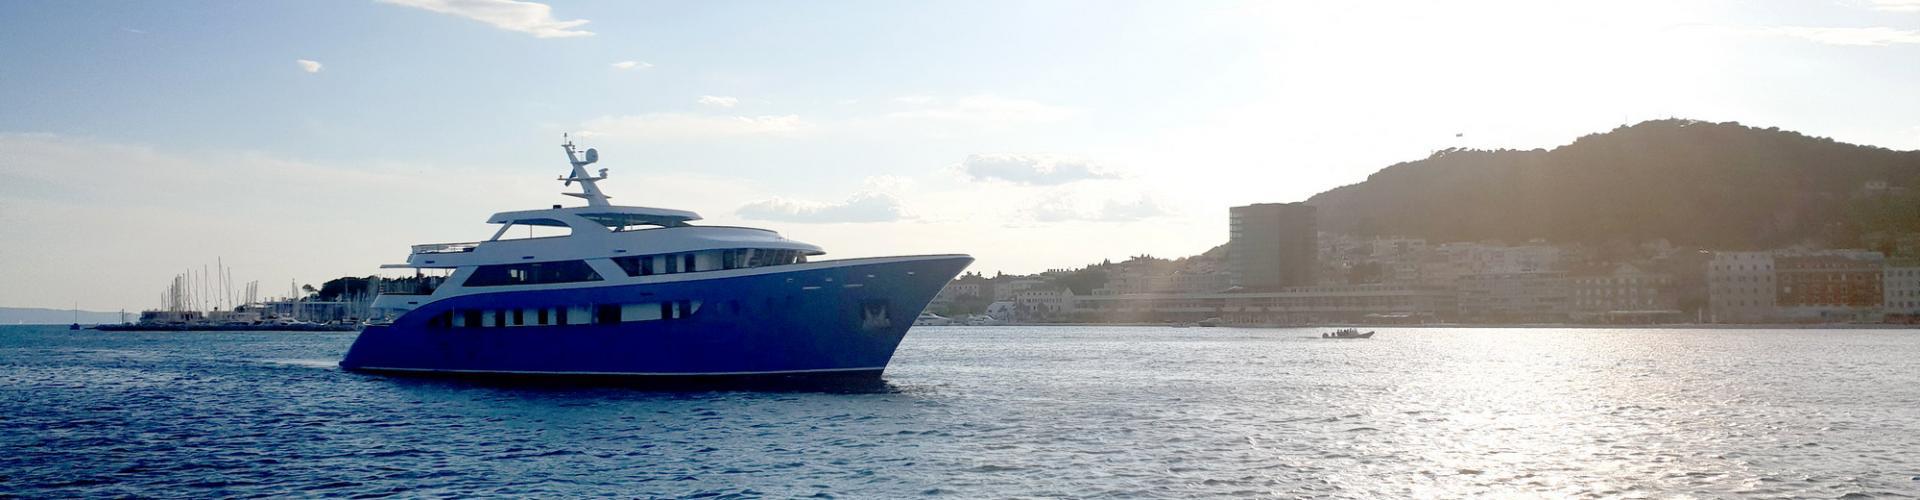 2018. Deluxe nave da crociera MV Antonio